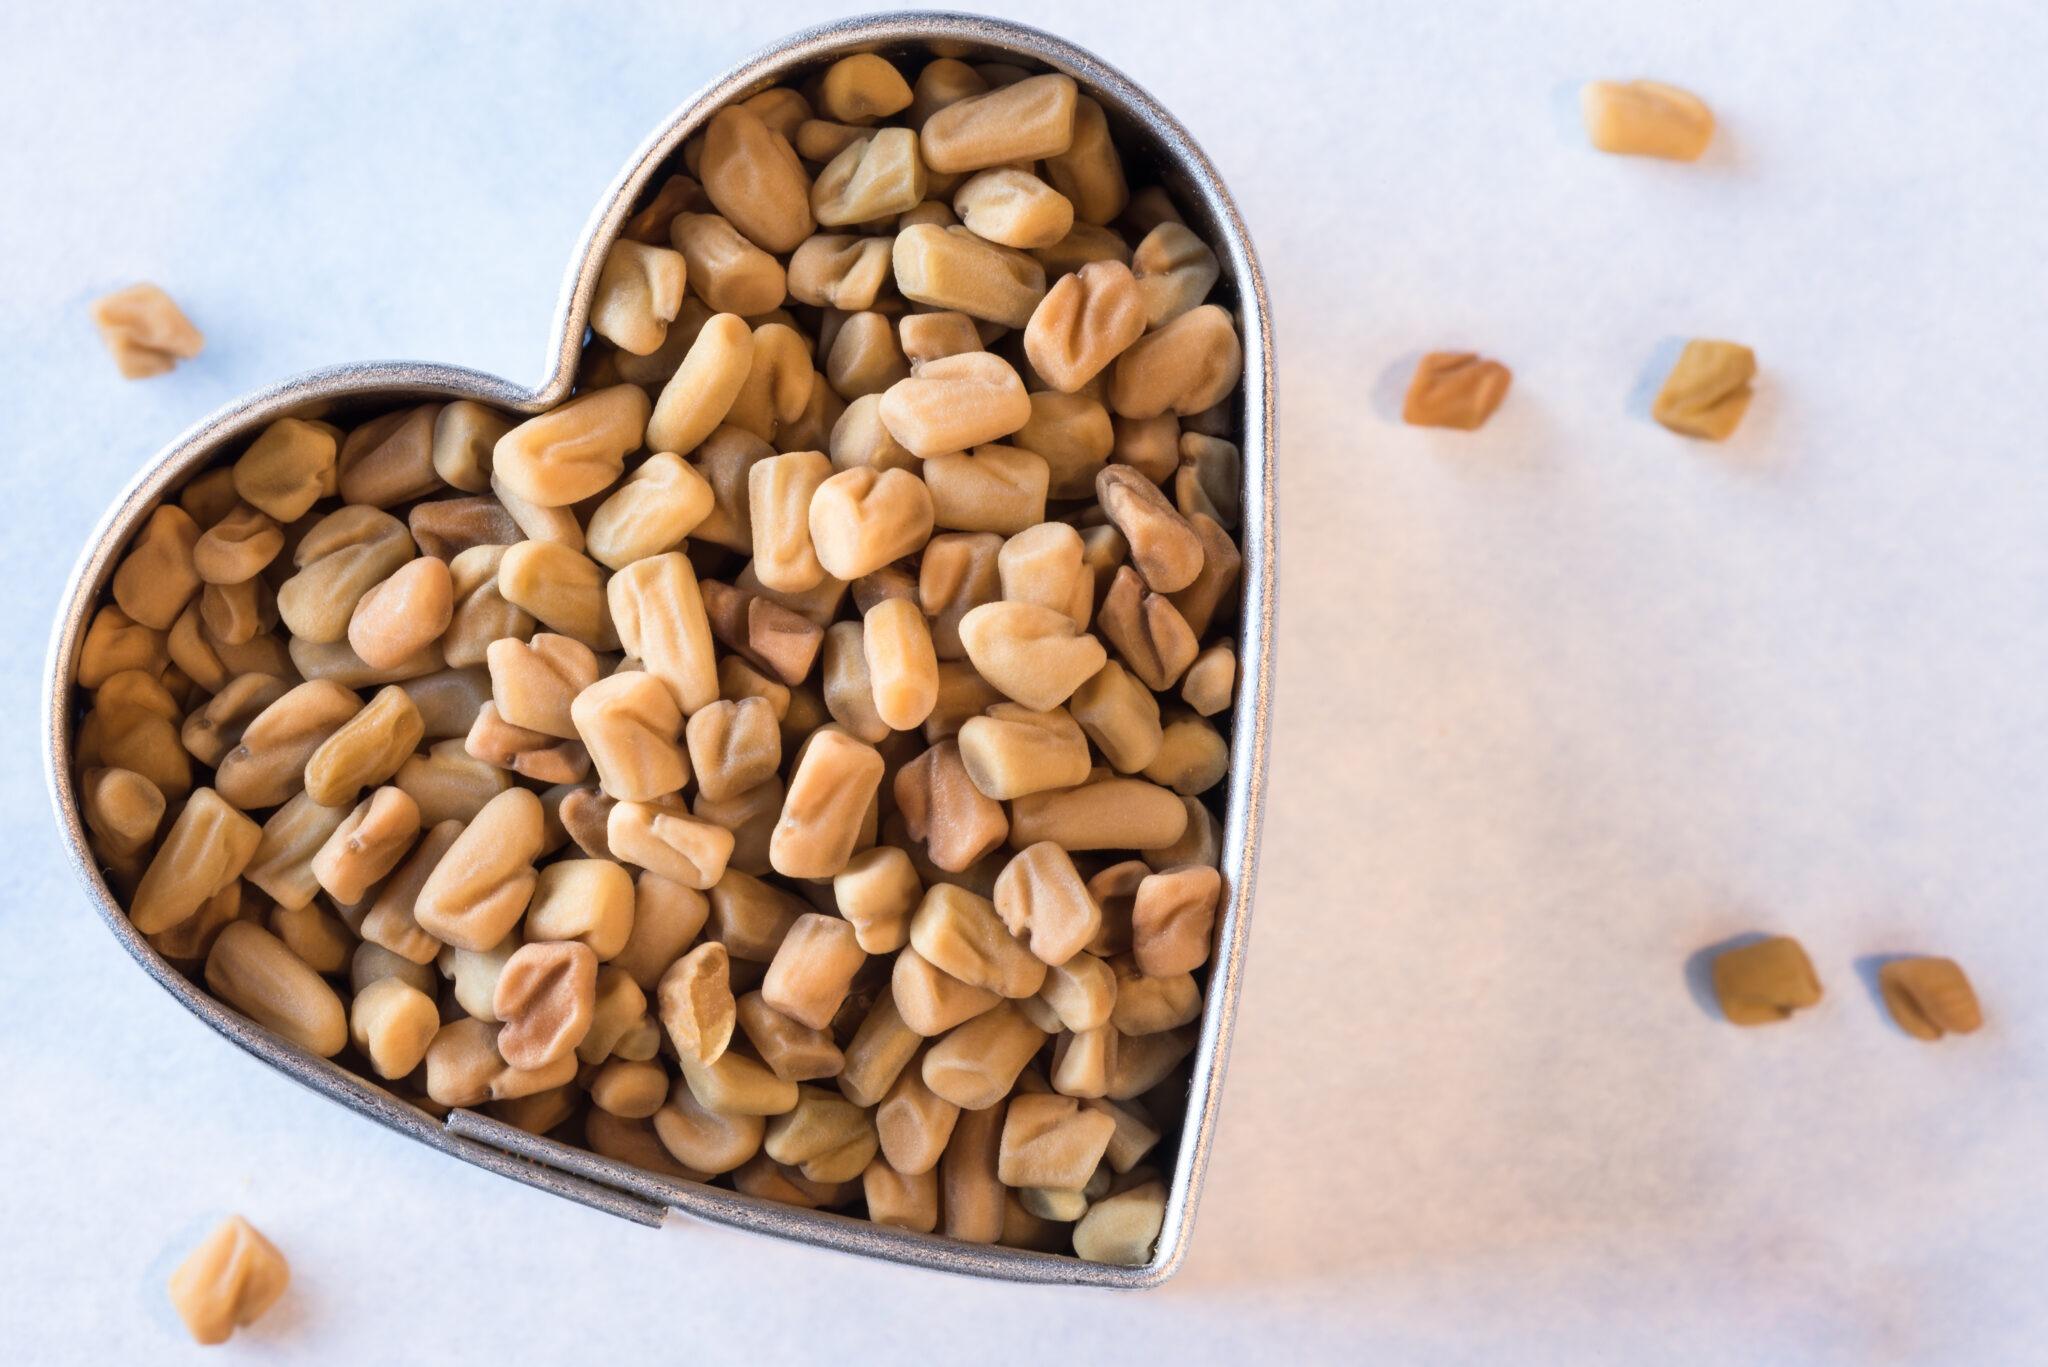 Fenugreek seed benefits